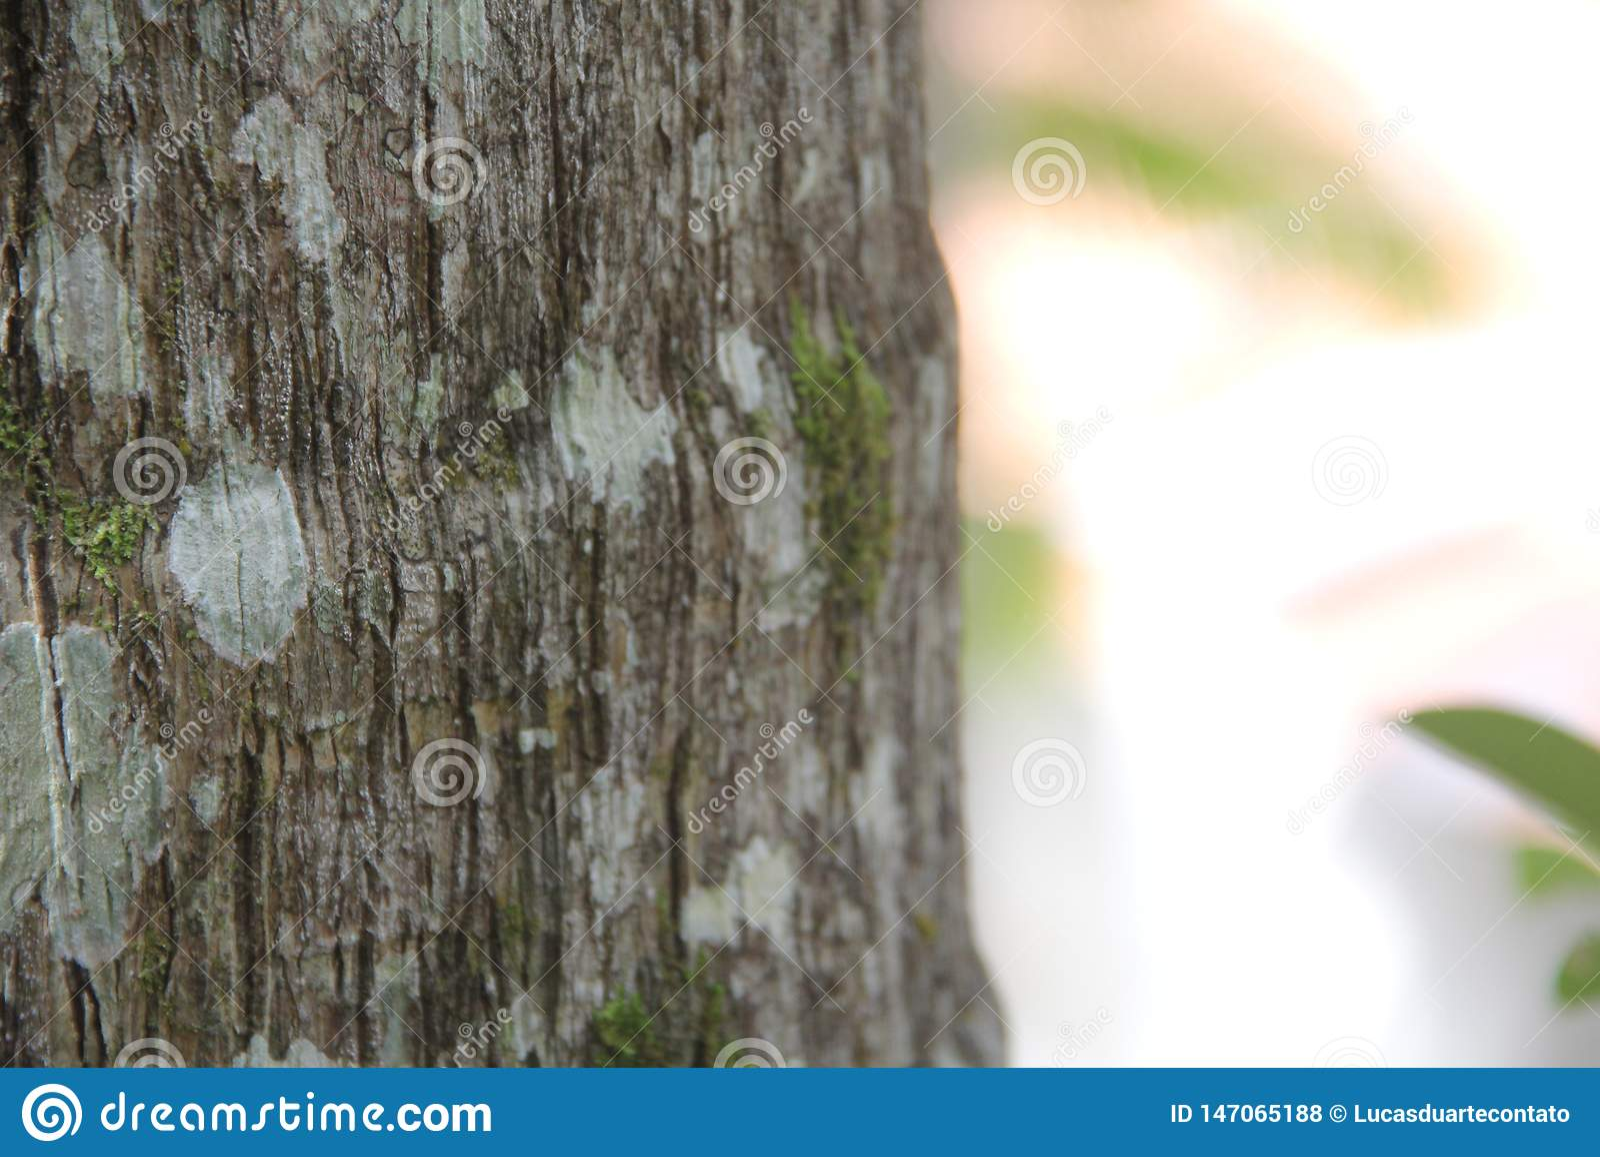 Close up on tree stump with moss